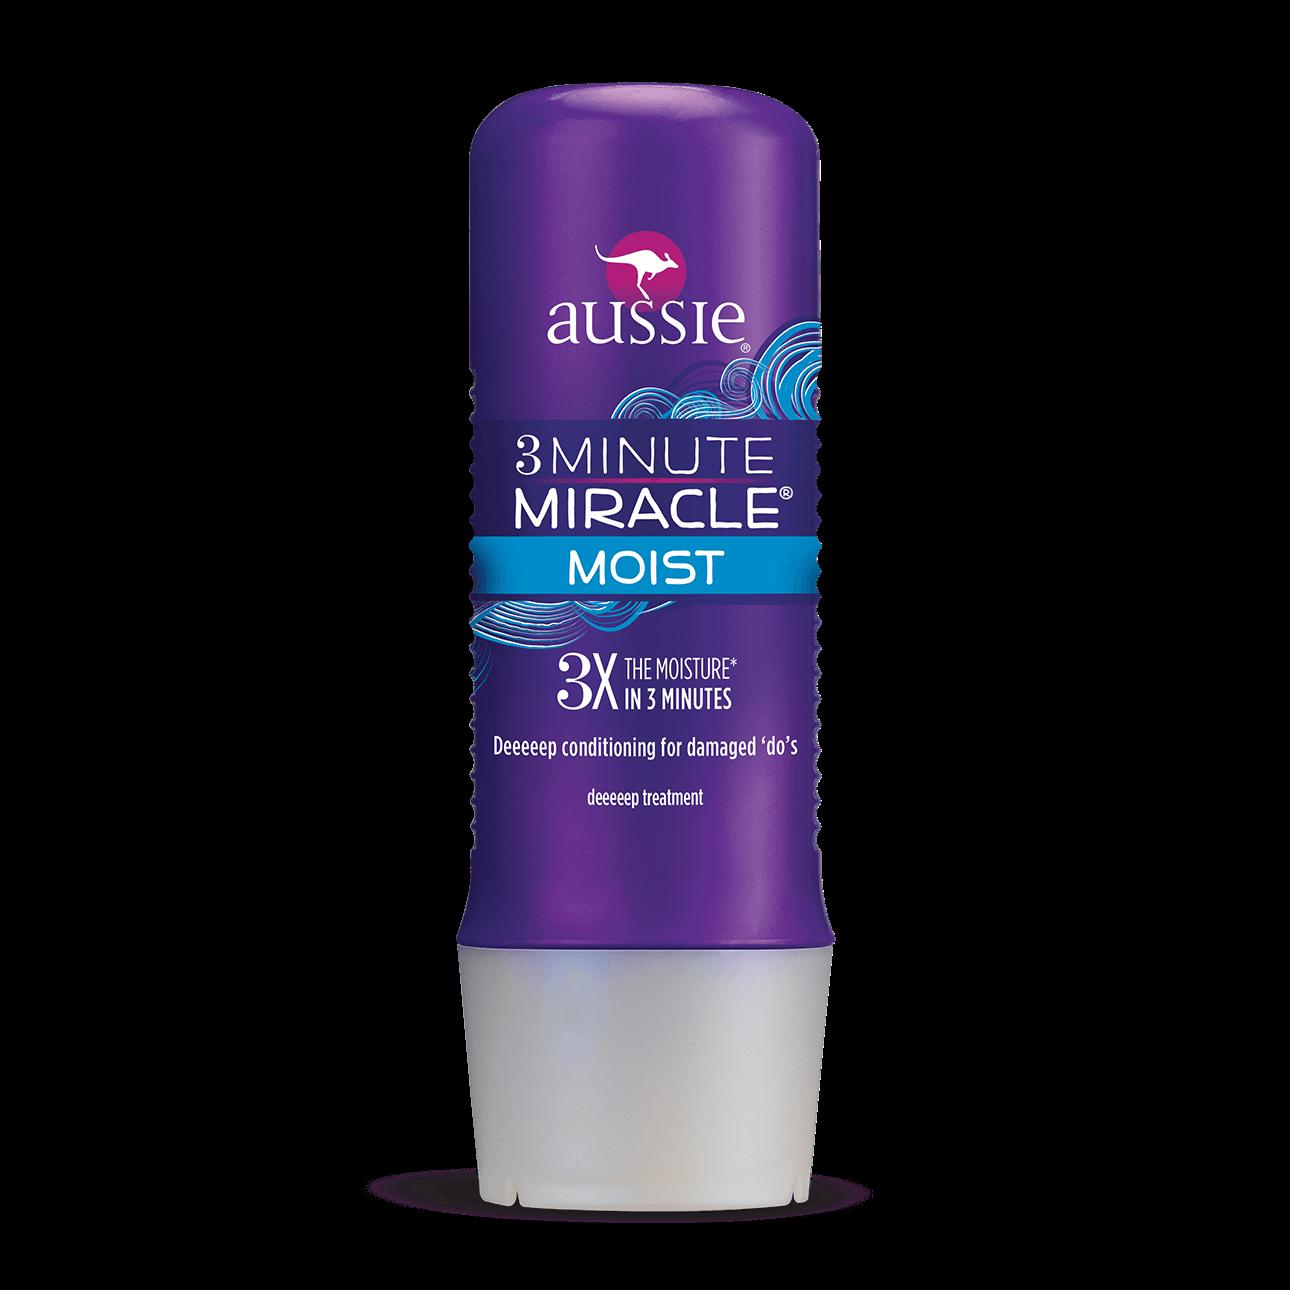 kit-de-tratamento-aussie-moist-shampoo-cond-mascara, moda sem censura, alex cursino, beauty tips, style tips, dicas de beleza, dicas de moda, 2